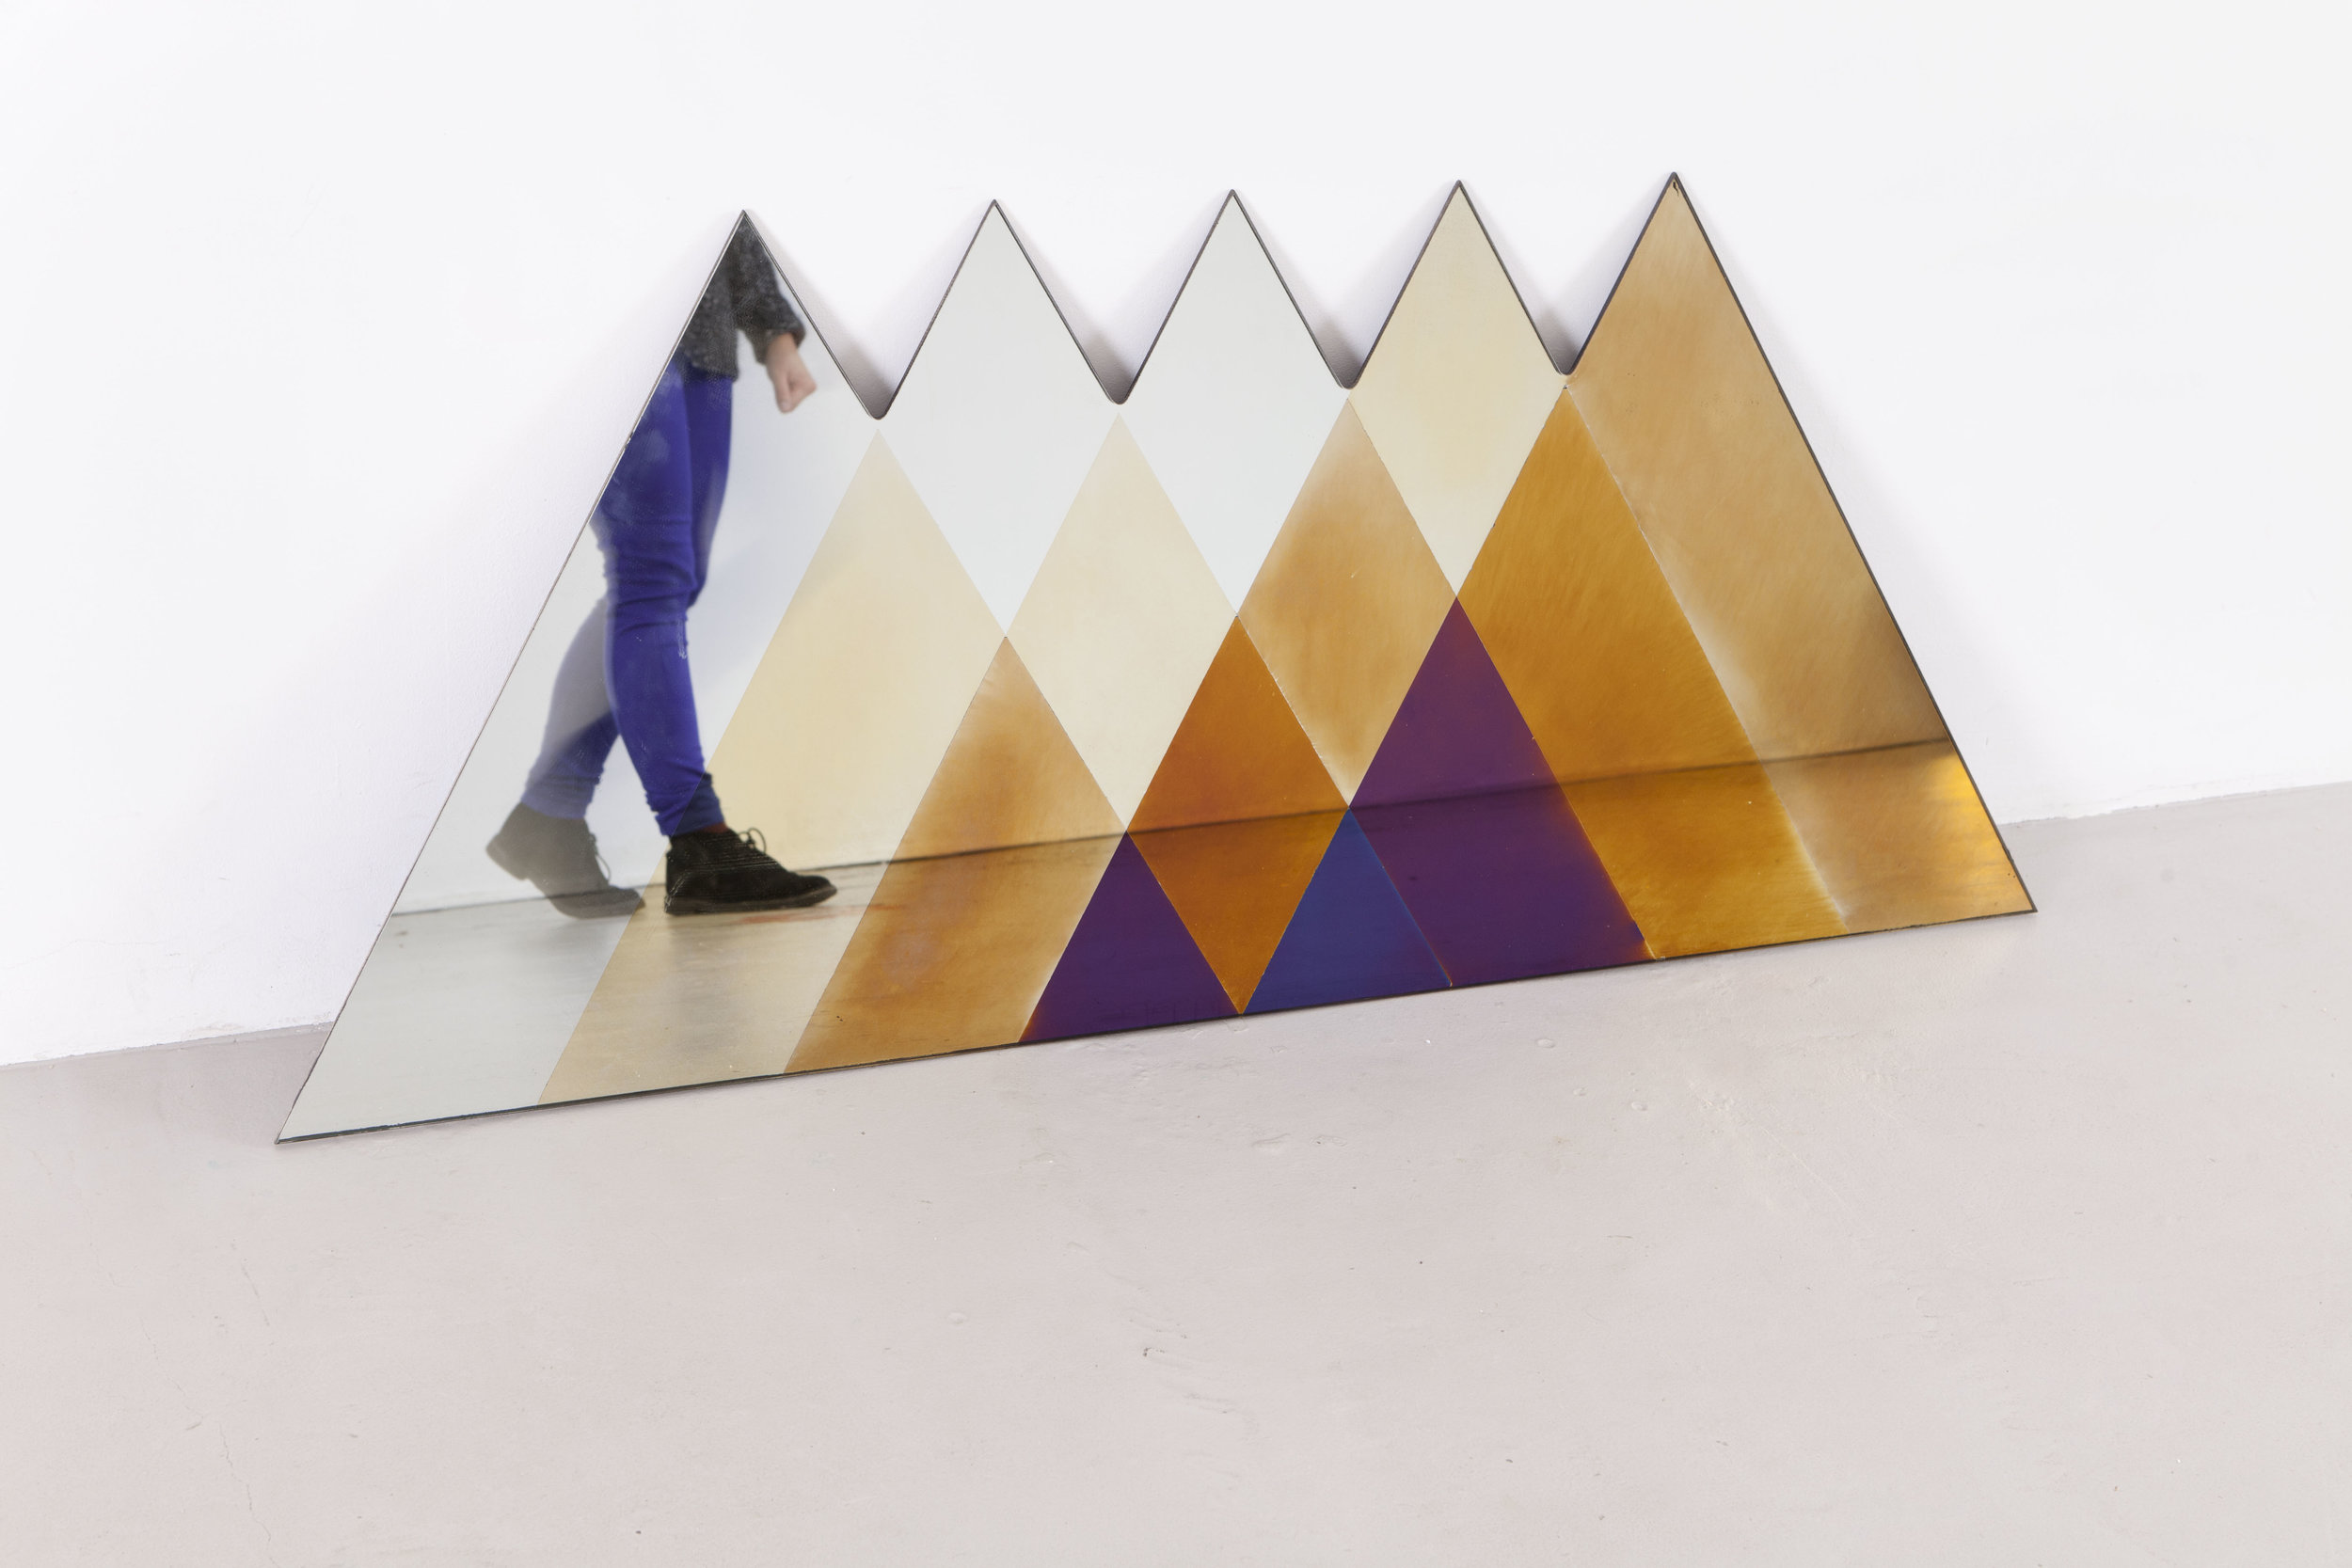 transnatural_Transience_mirror_triangle+feet_byfloorknaapen_23.jpg